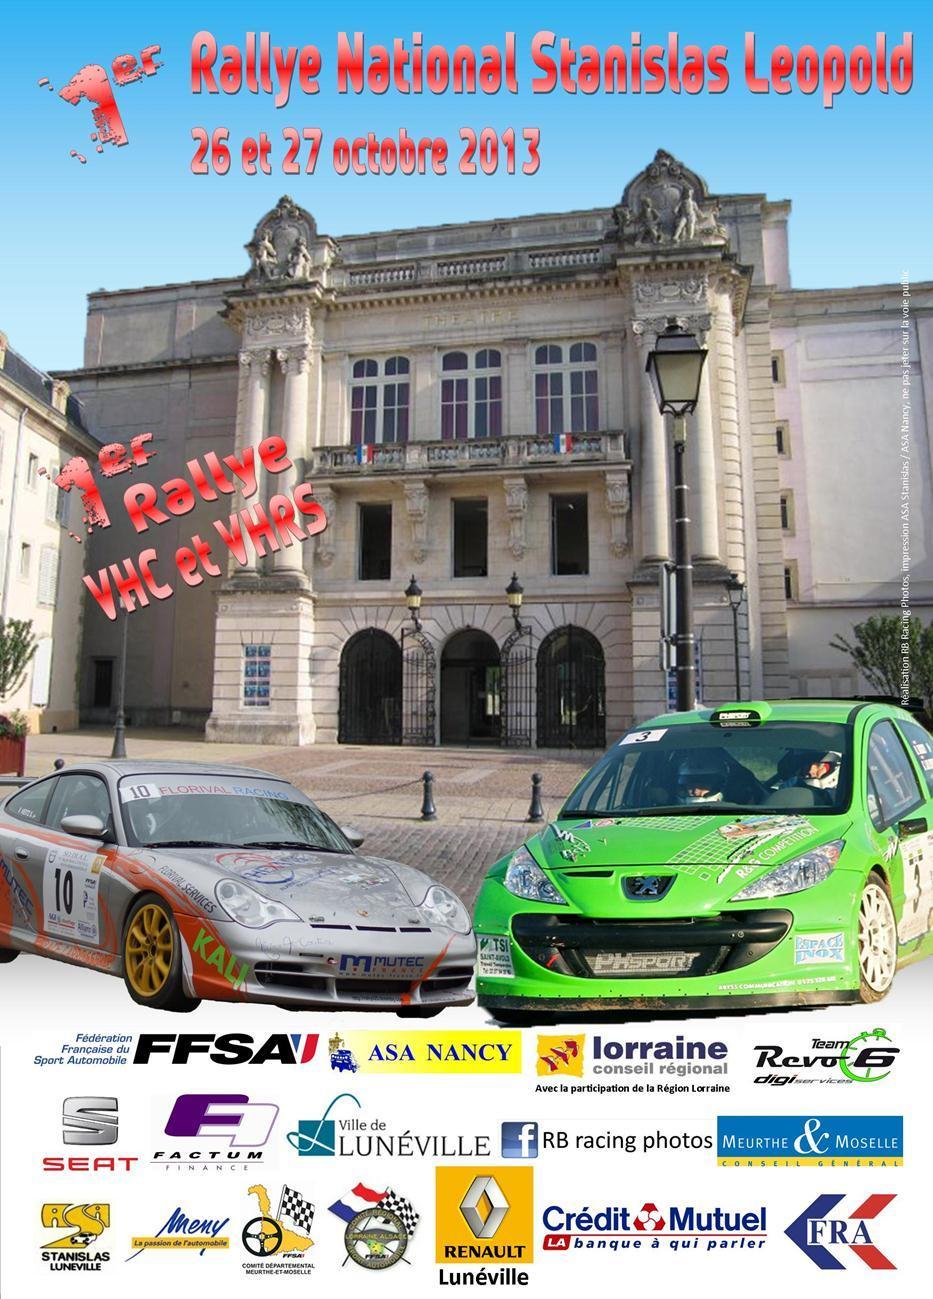 Rallye-Stanislas-Leopold-2013